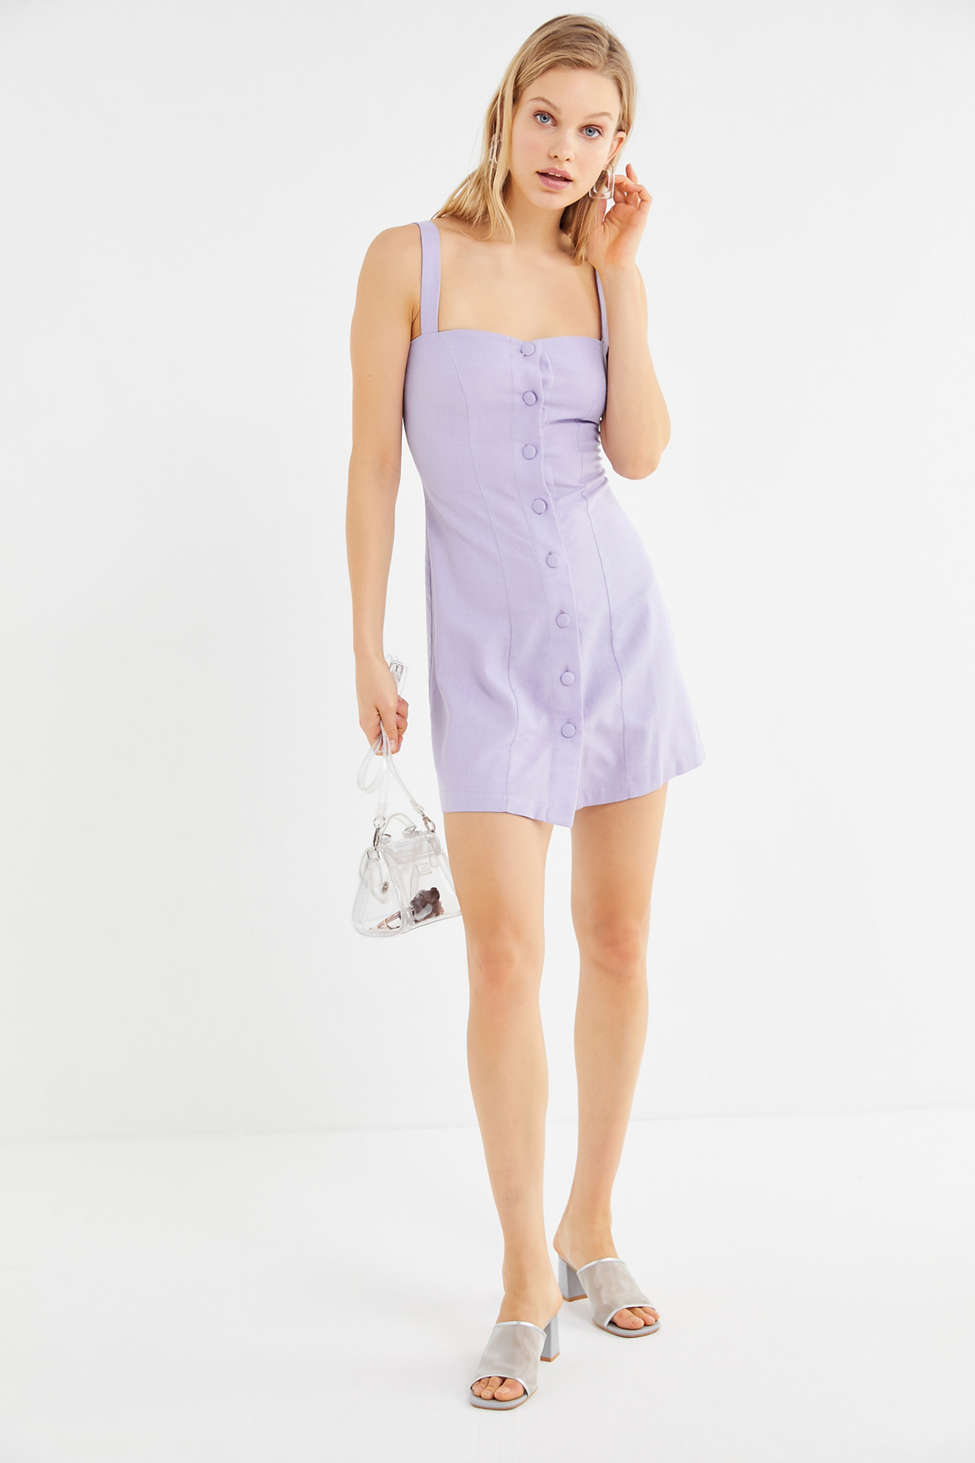 Rita Row Coco Button Front Mini Dress by Rita Row